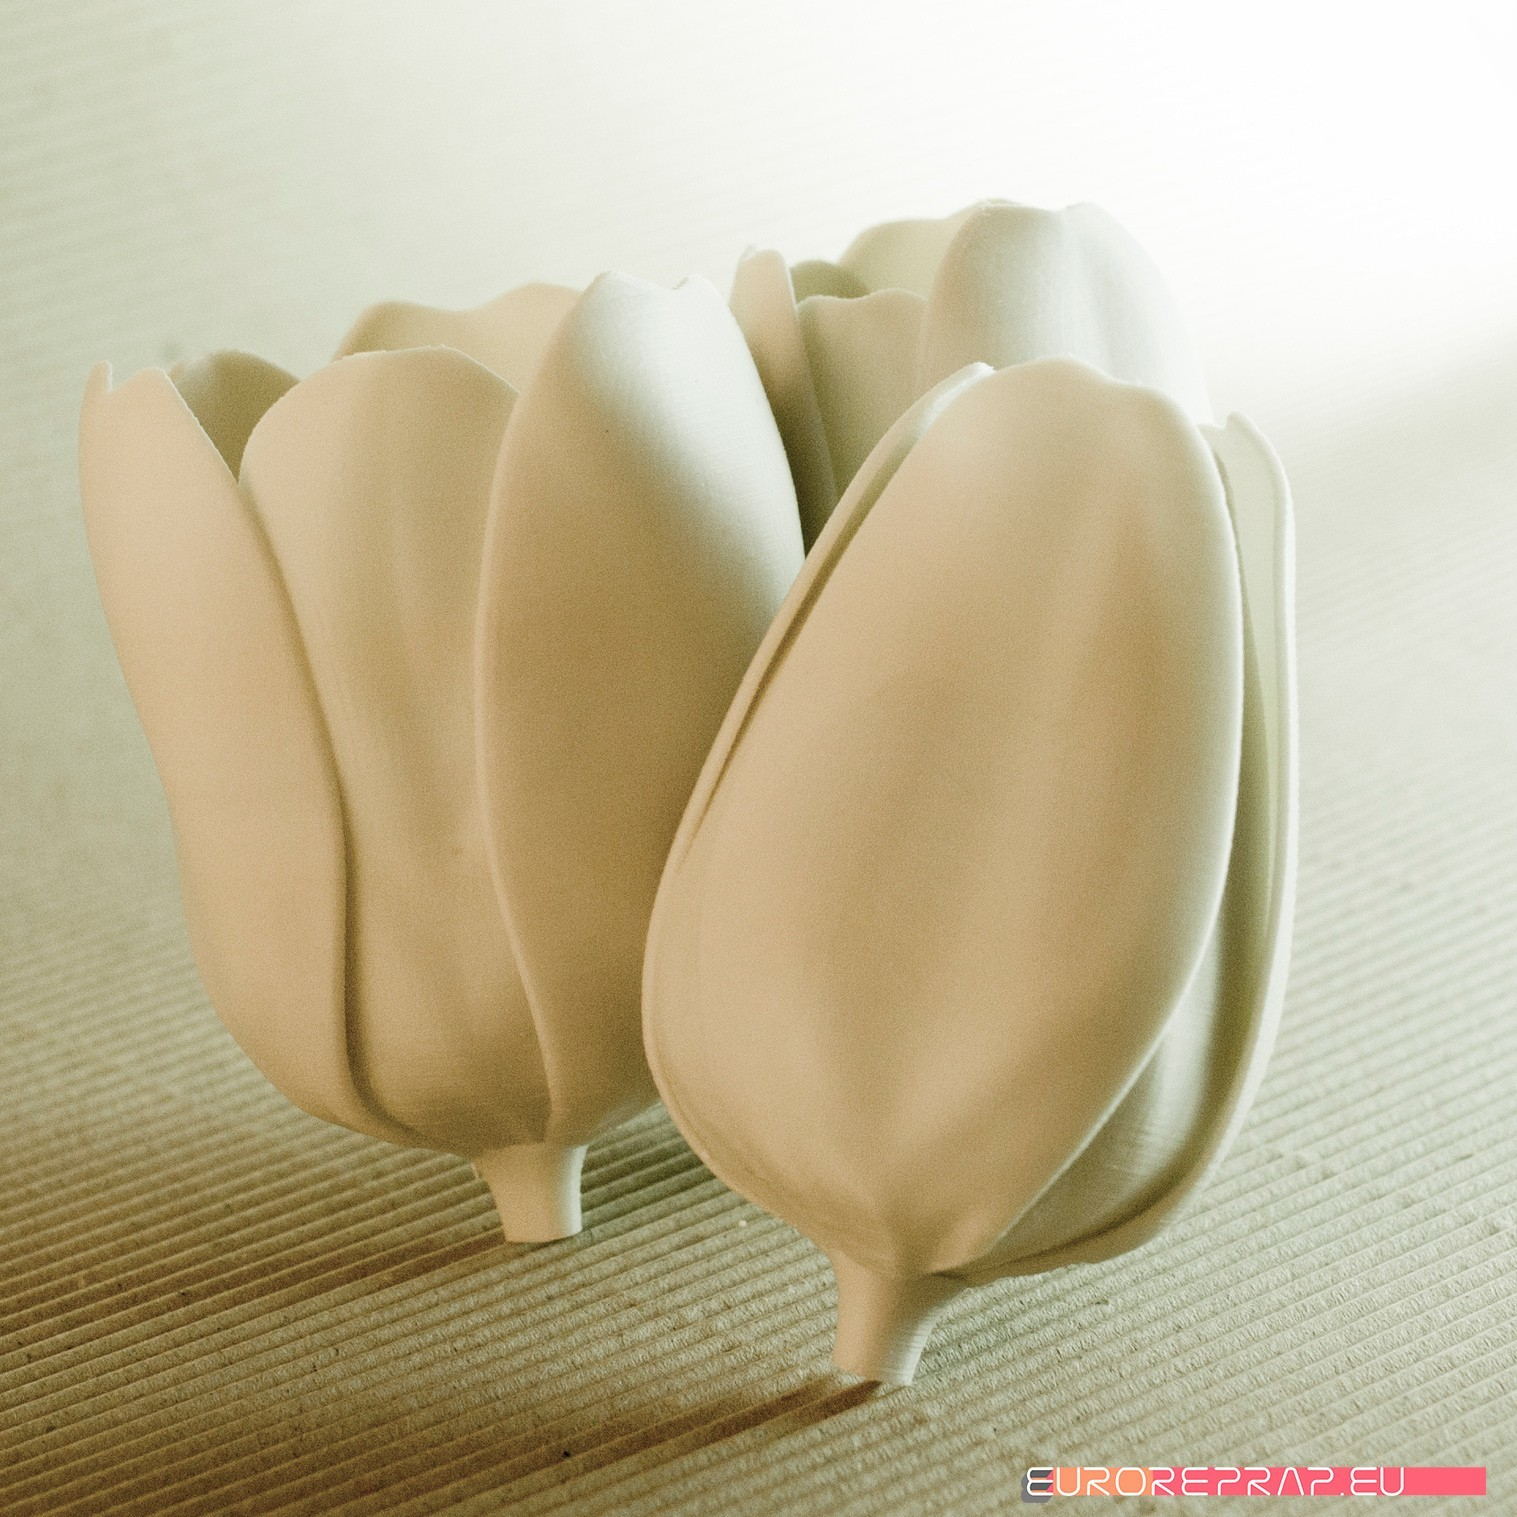 01.jpg Download STL file flowers: Tulip - 3D printable model • 3D printable design, euroreprap_eu